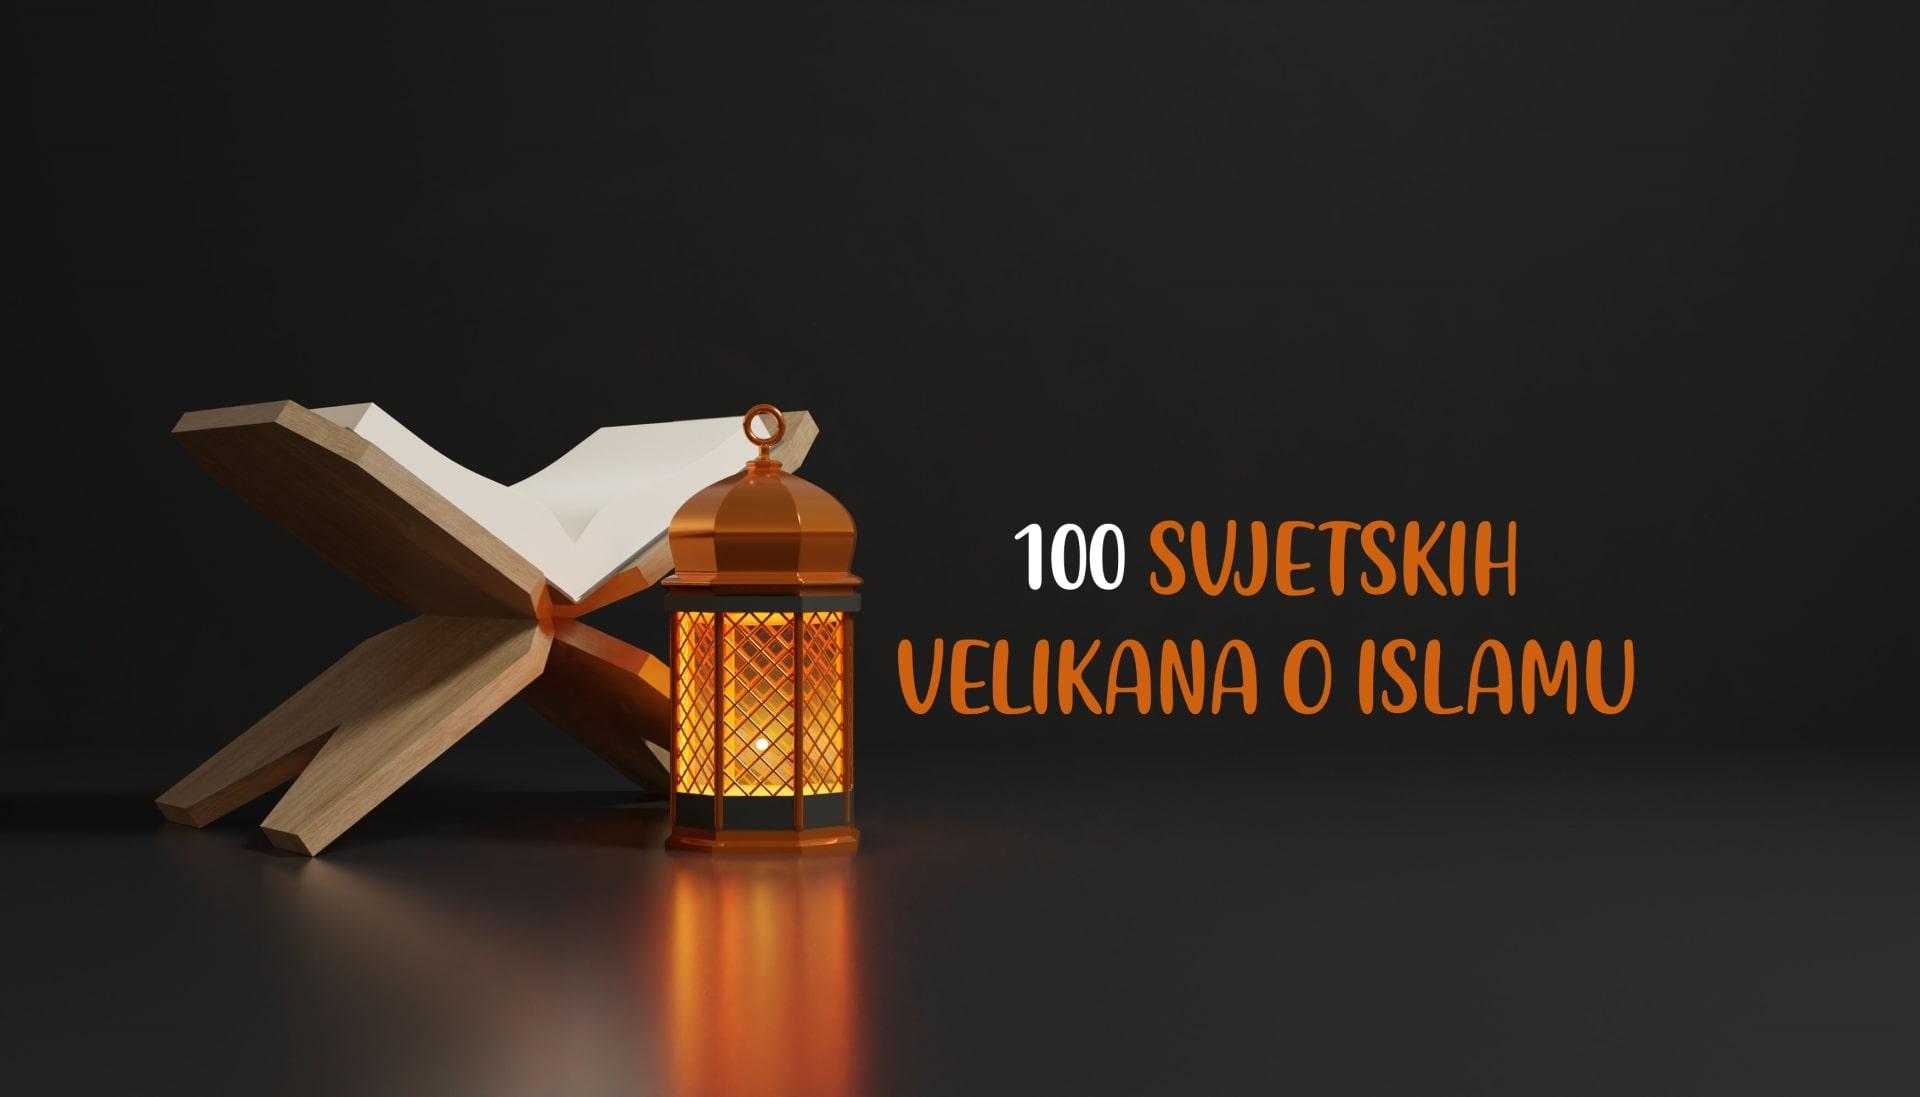 100 svjetskih velikana o islamu – Emanuel Kant Samir Bikić Poučne priče Islamski tekstovi islamske knjige El-Kelimeh